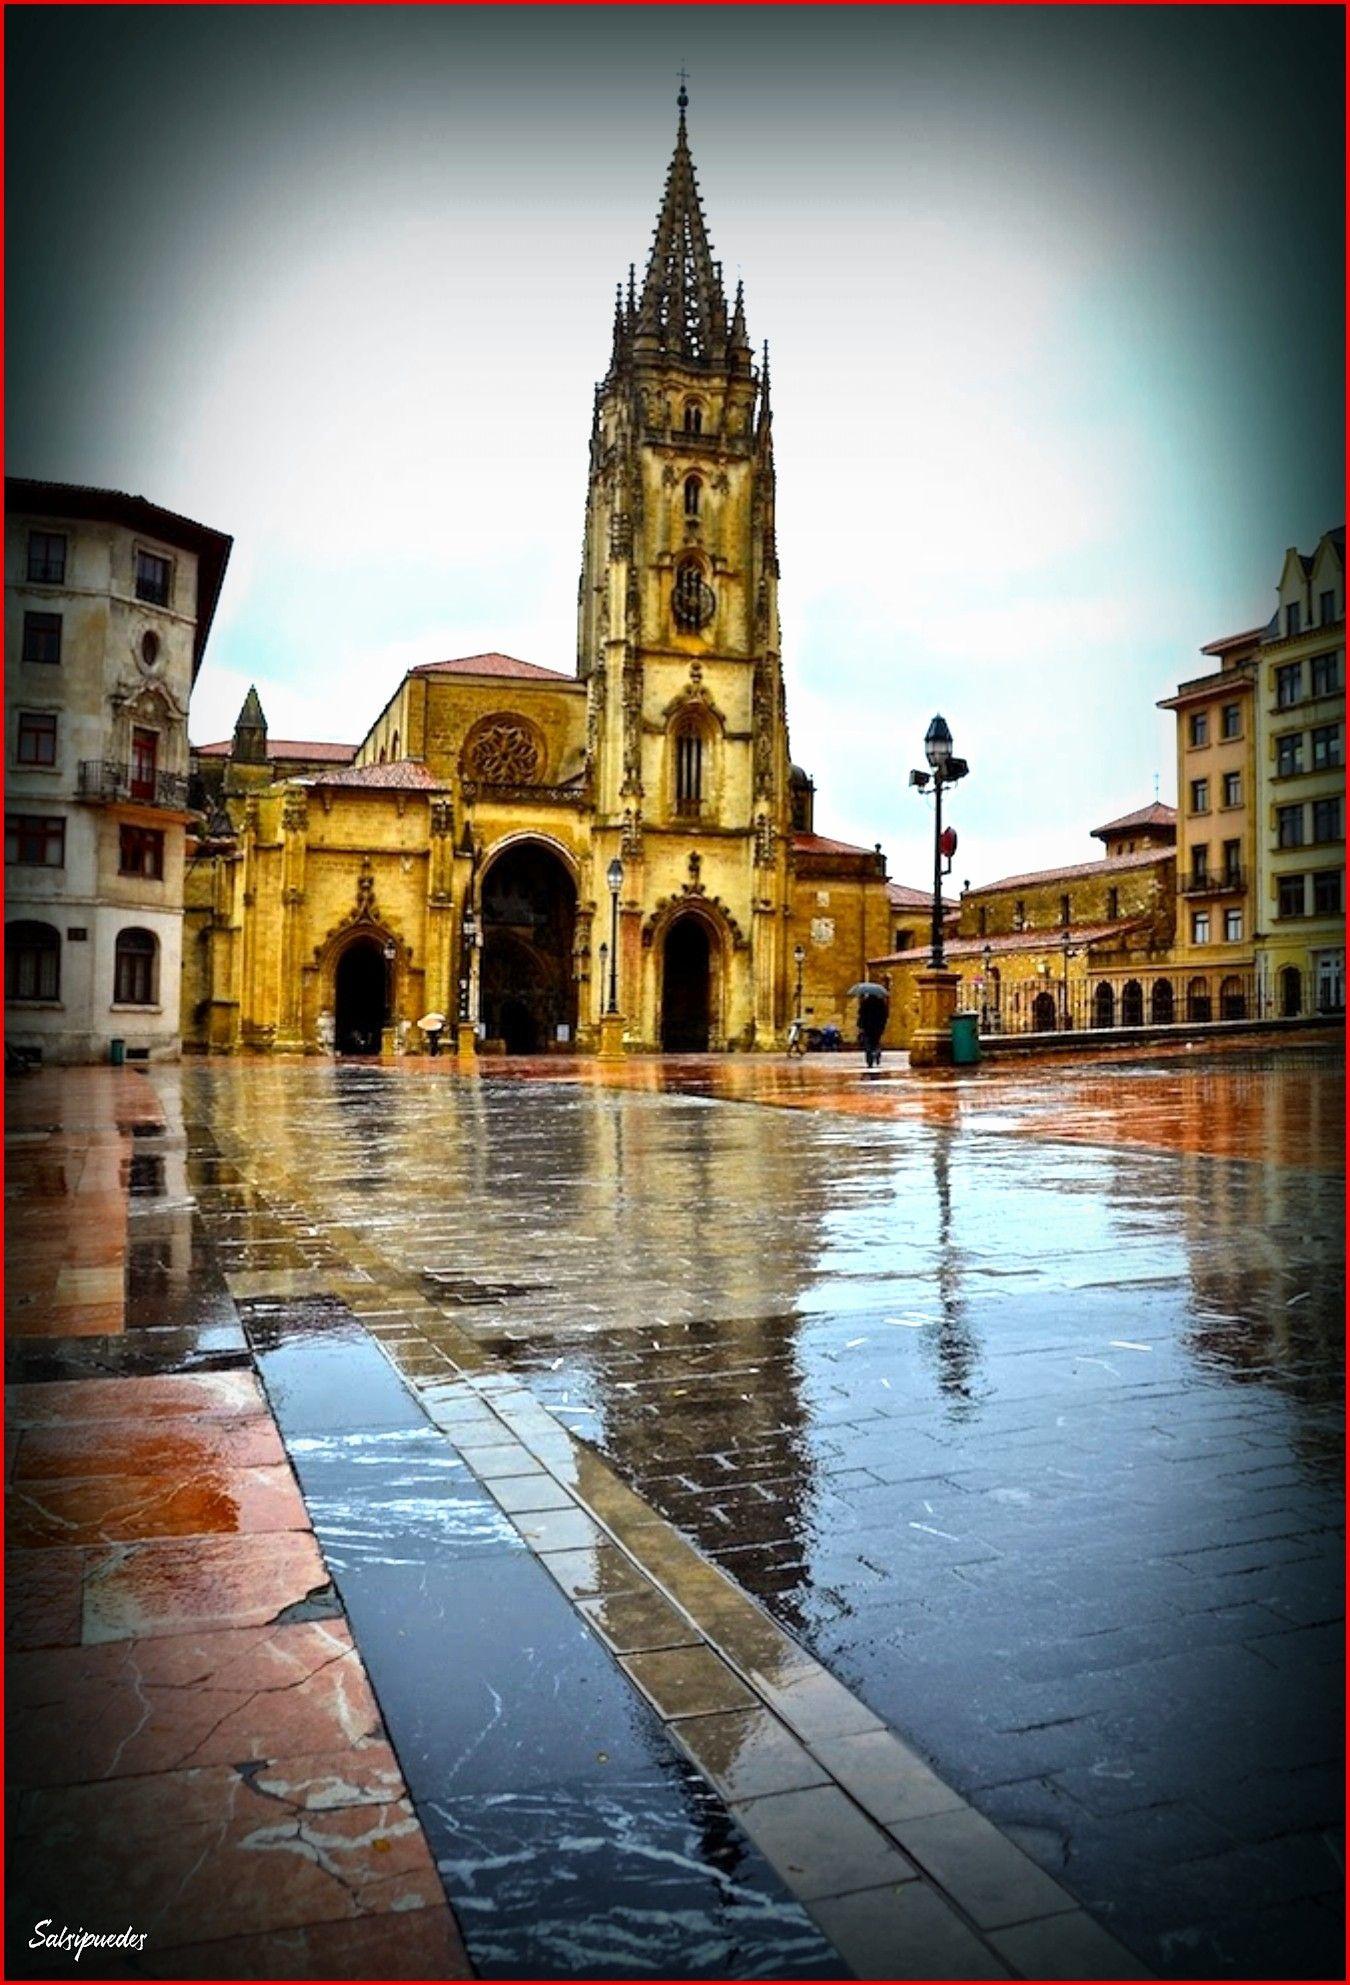 Imagen Sobre Oviedo De Salsipuedes En Oviedo